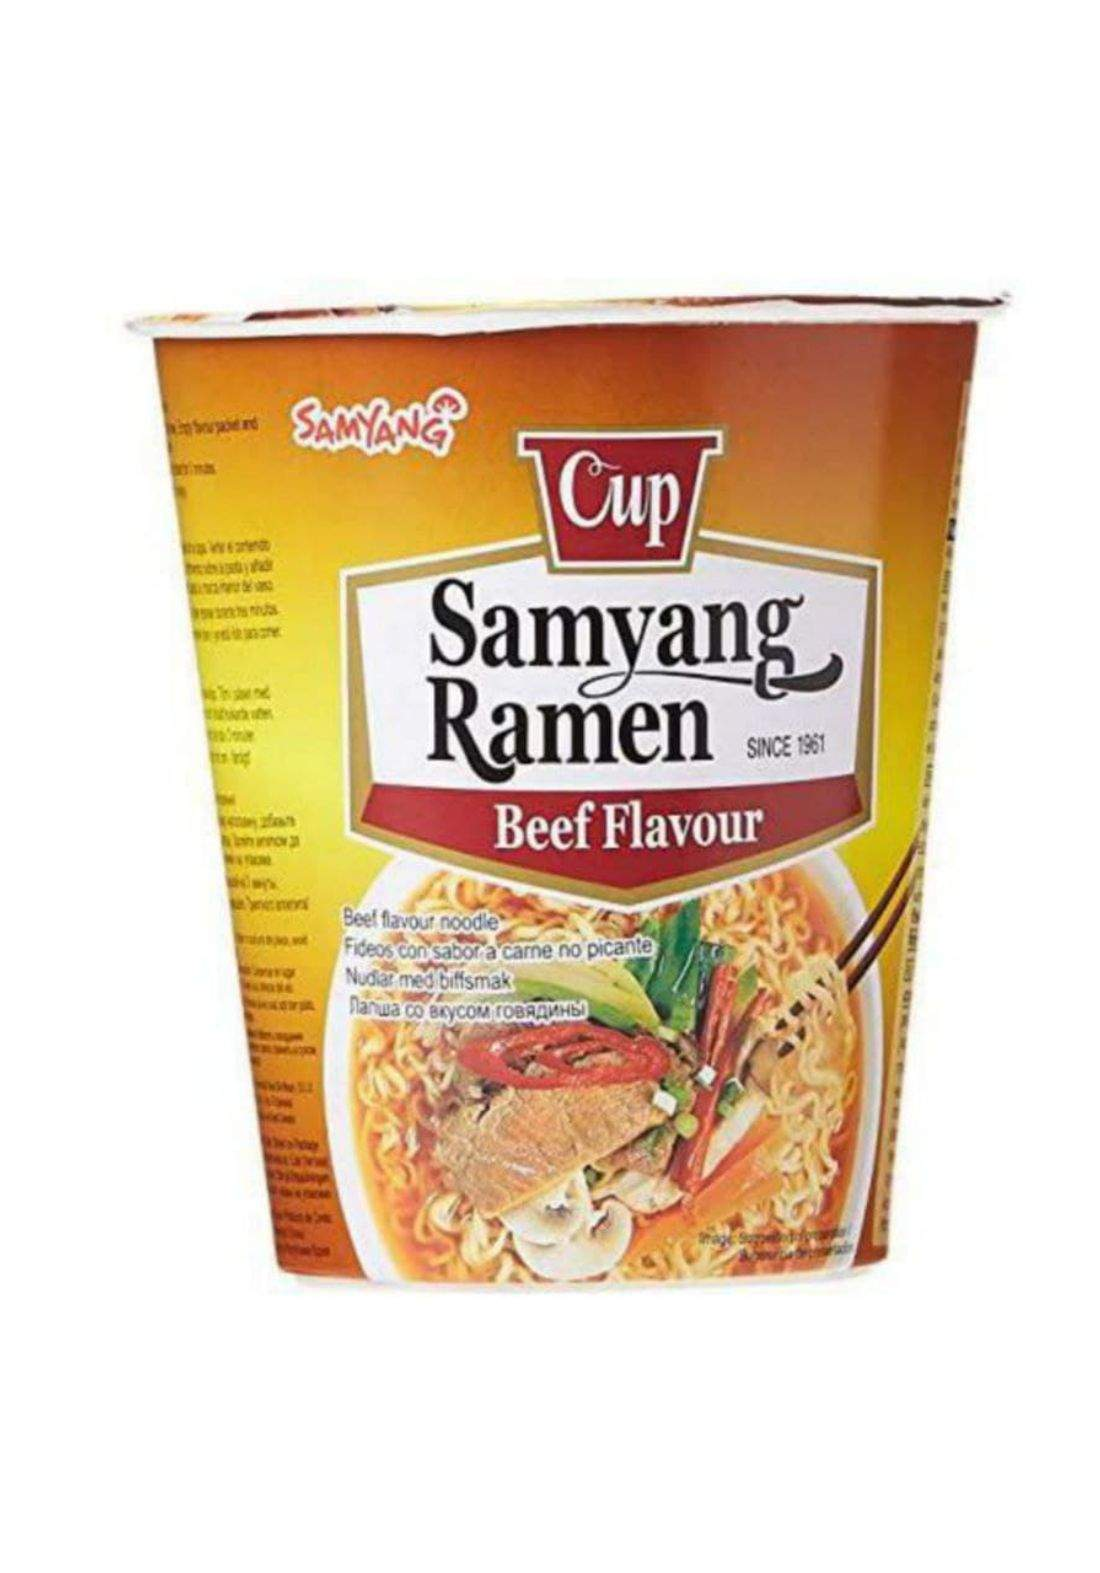 Cup samyang ramen 65g نودلز كوري